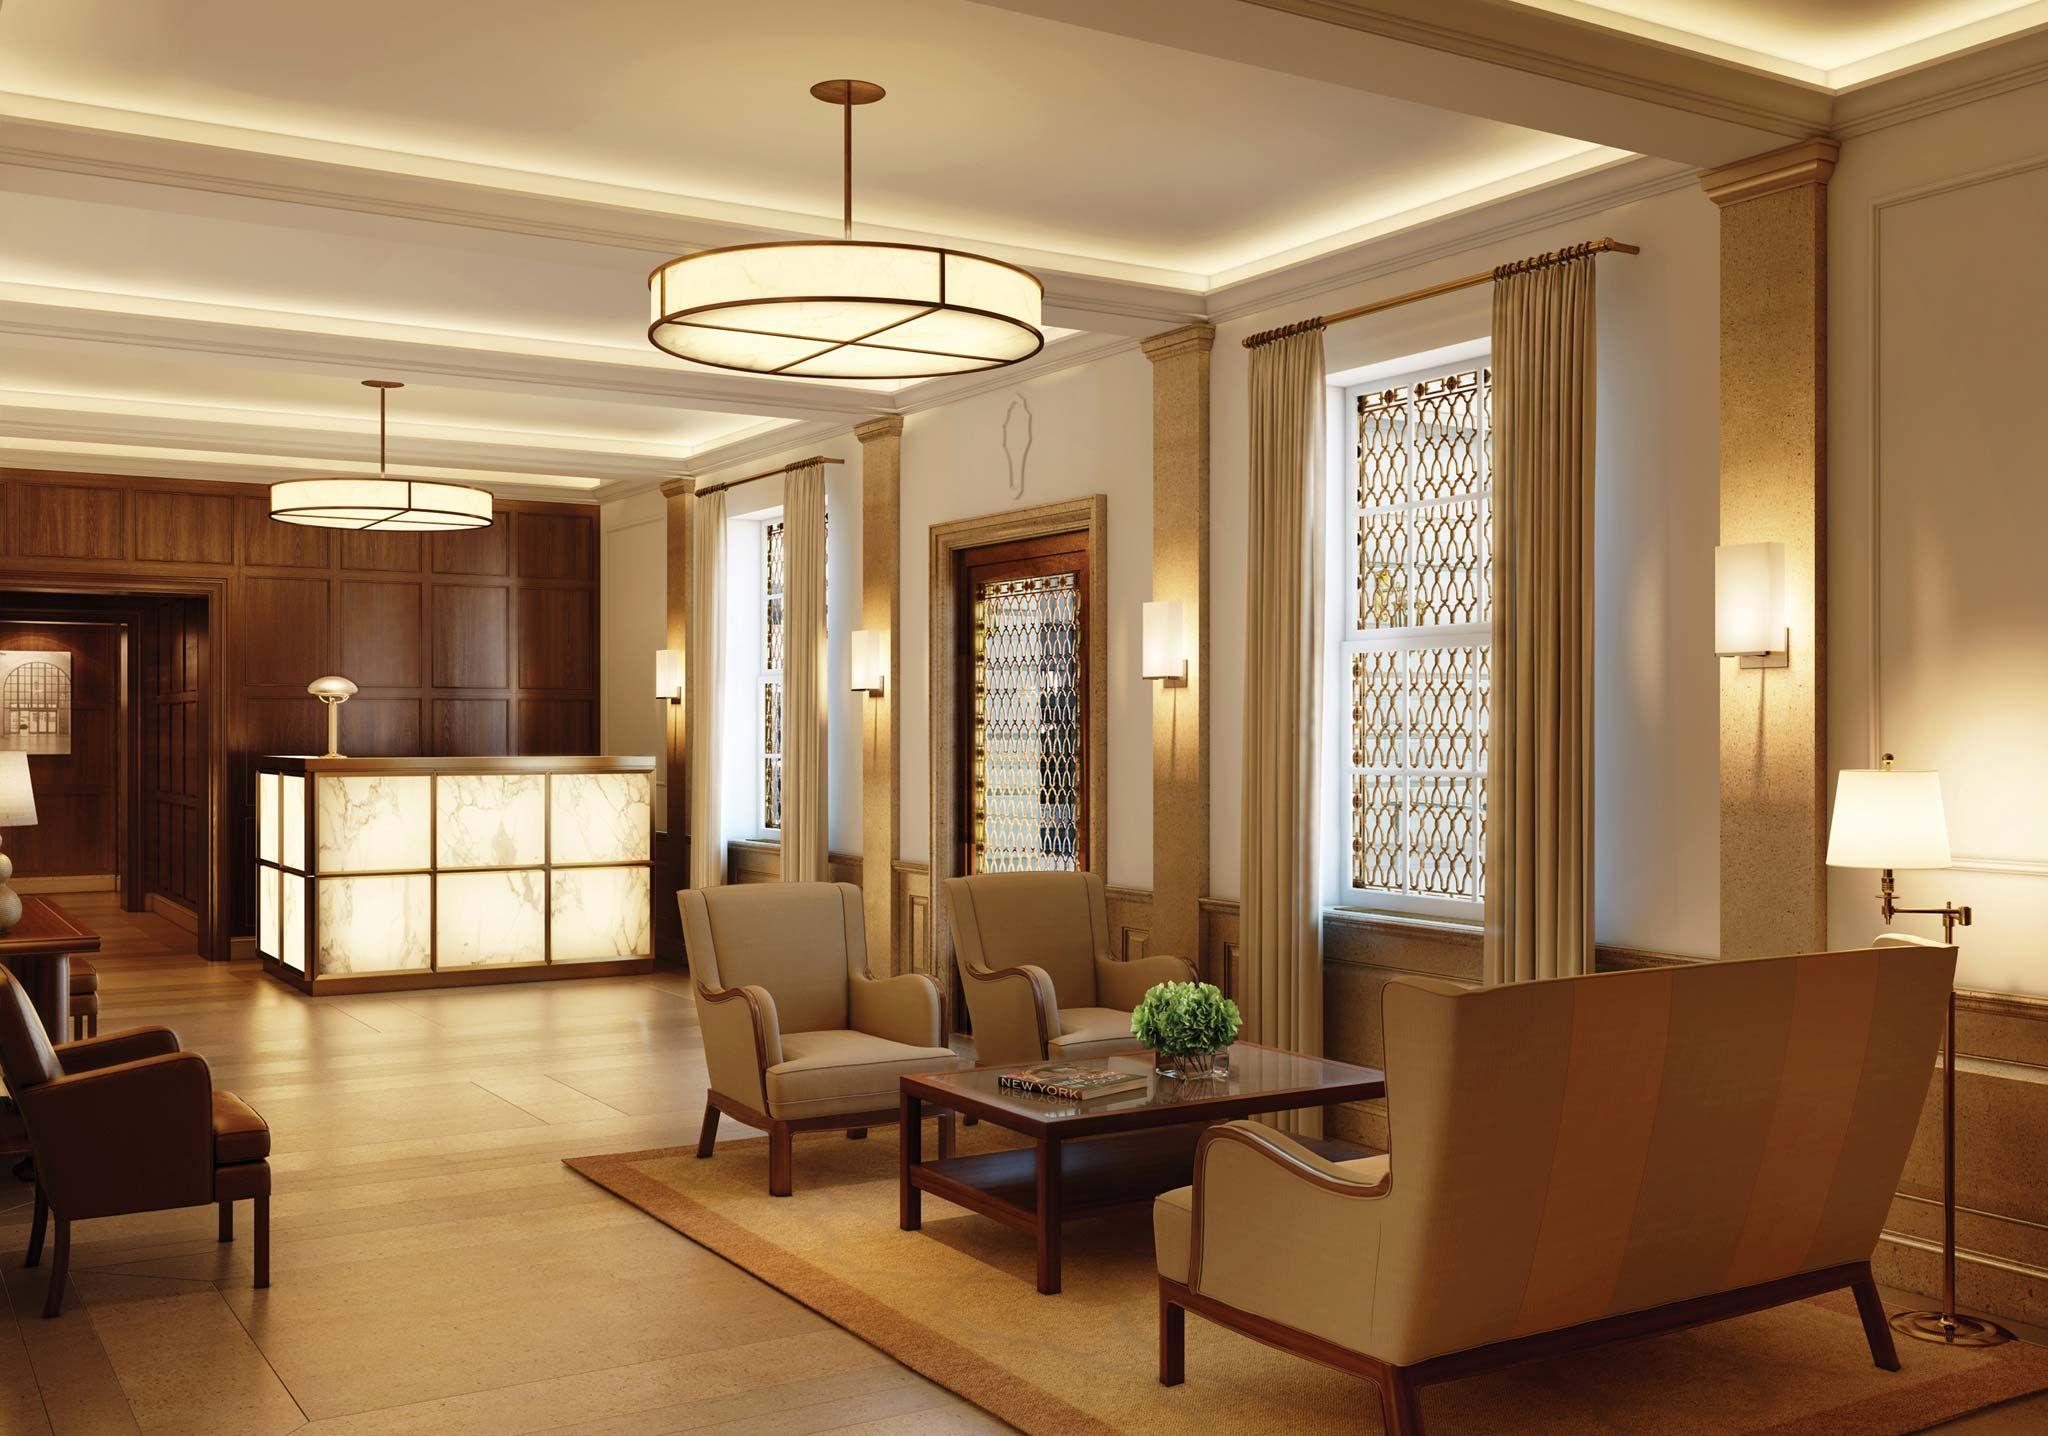 Luxury Upper East Side apartments lobby. Luxury Upper East Side apartments lobby   Harmony   Pinterest